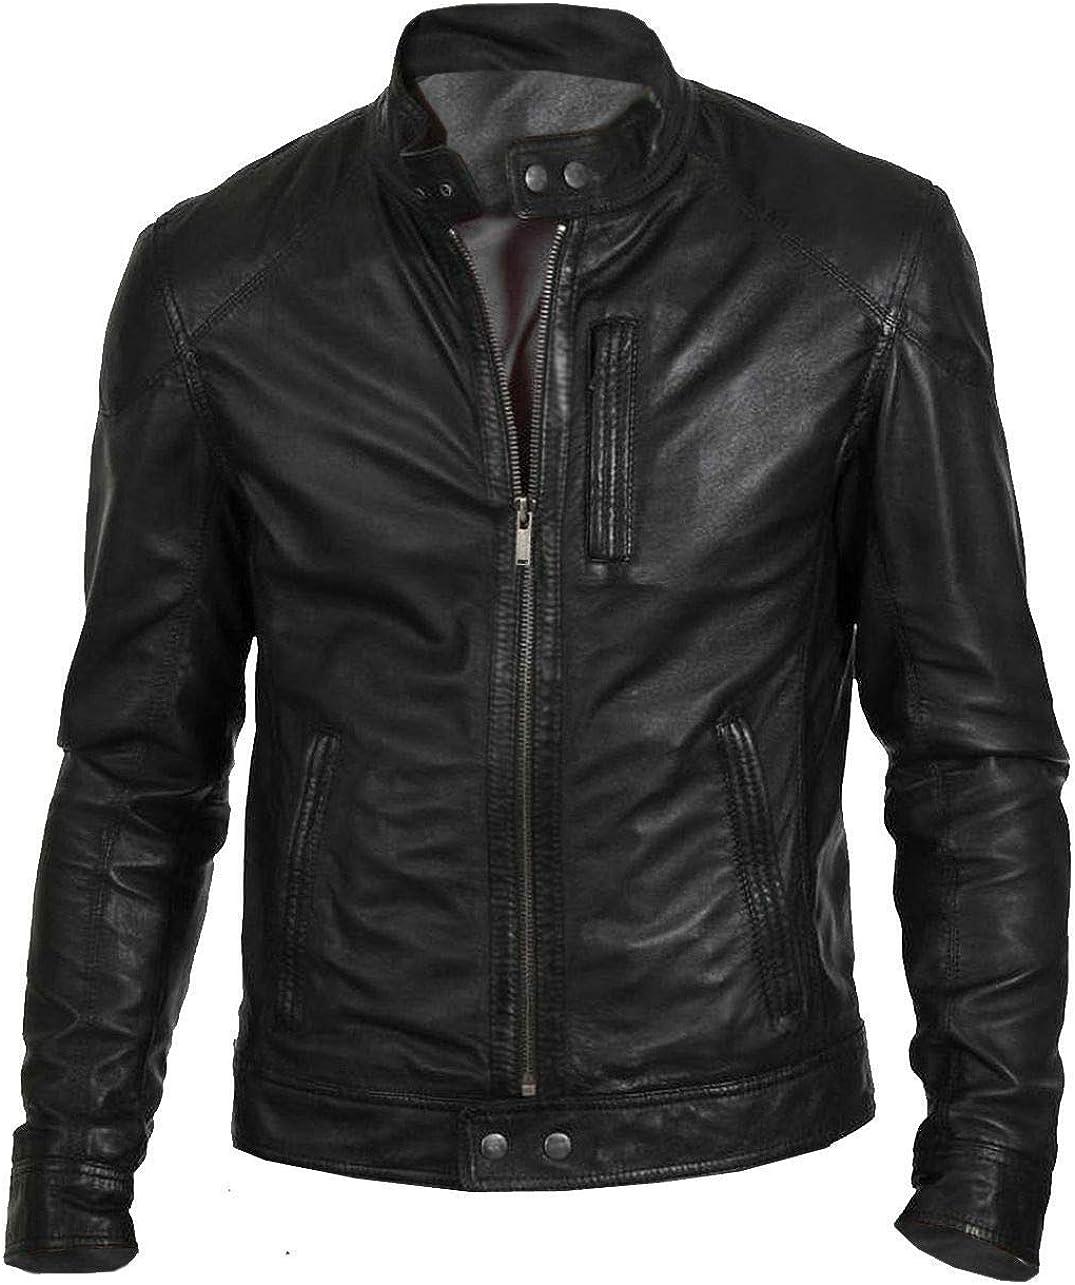 Zamish Leather Men's Hunt Black Classic Fashion Biker Jacket in Lambskin Leather